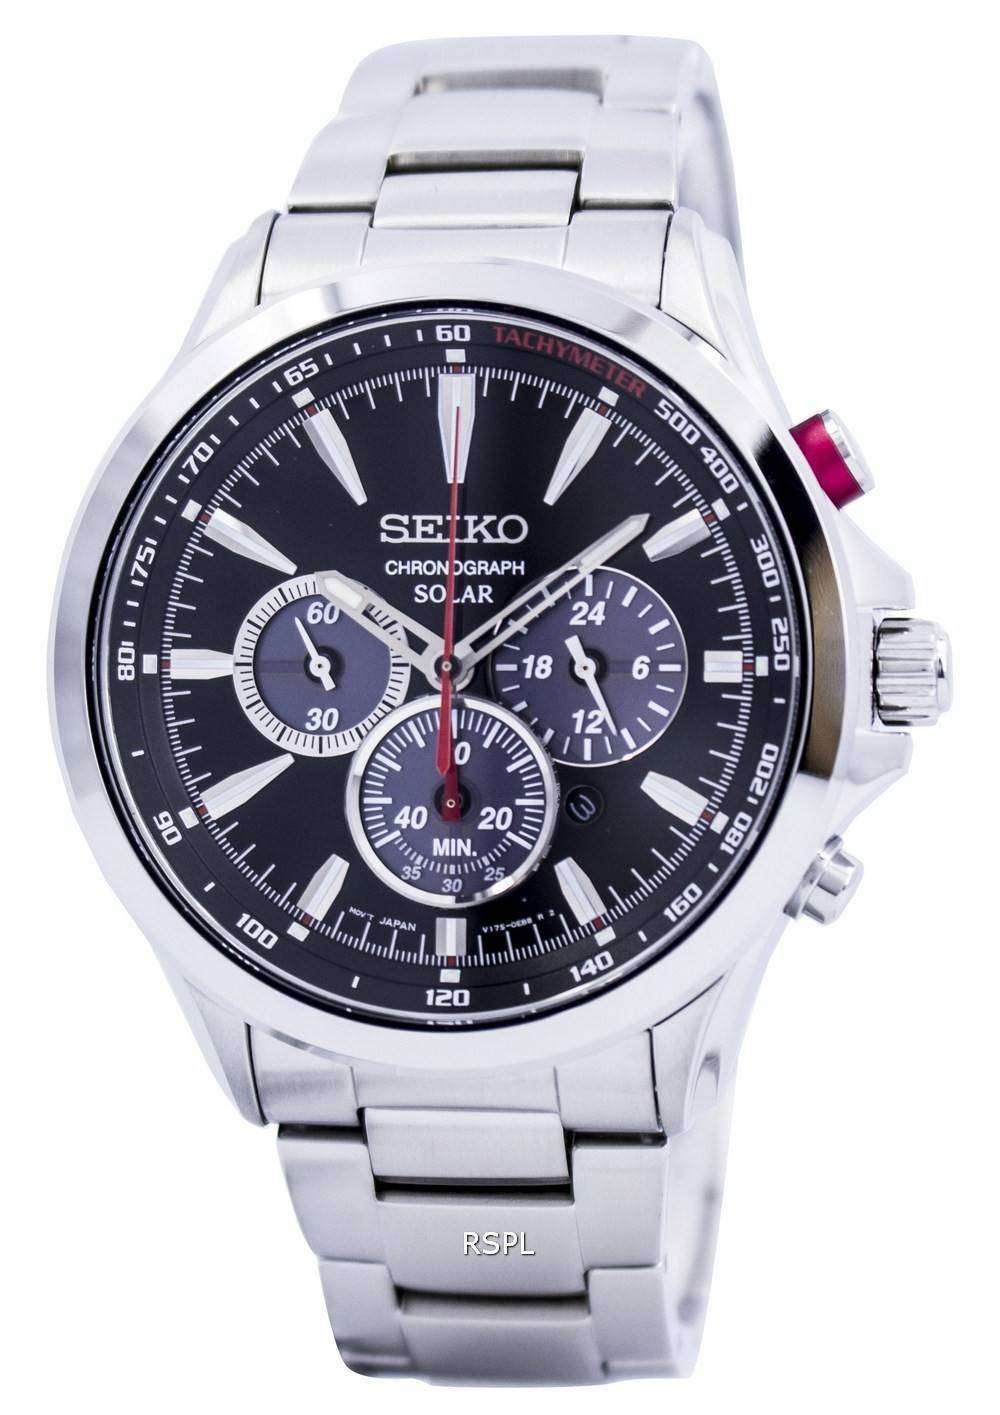 Seiko Solar Chronograph Tachymeter SSC493 SSC493P1 SSC493P Mens Watch - ZetaWatches